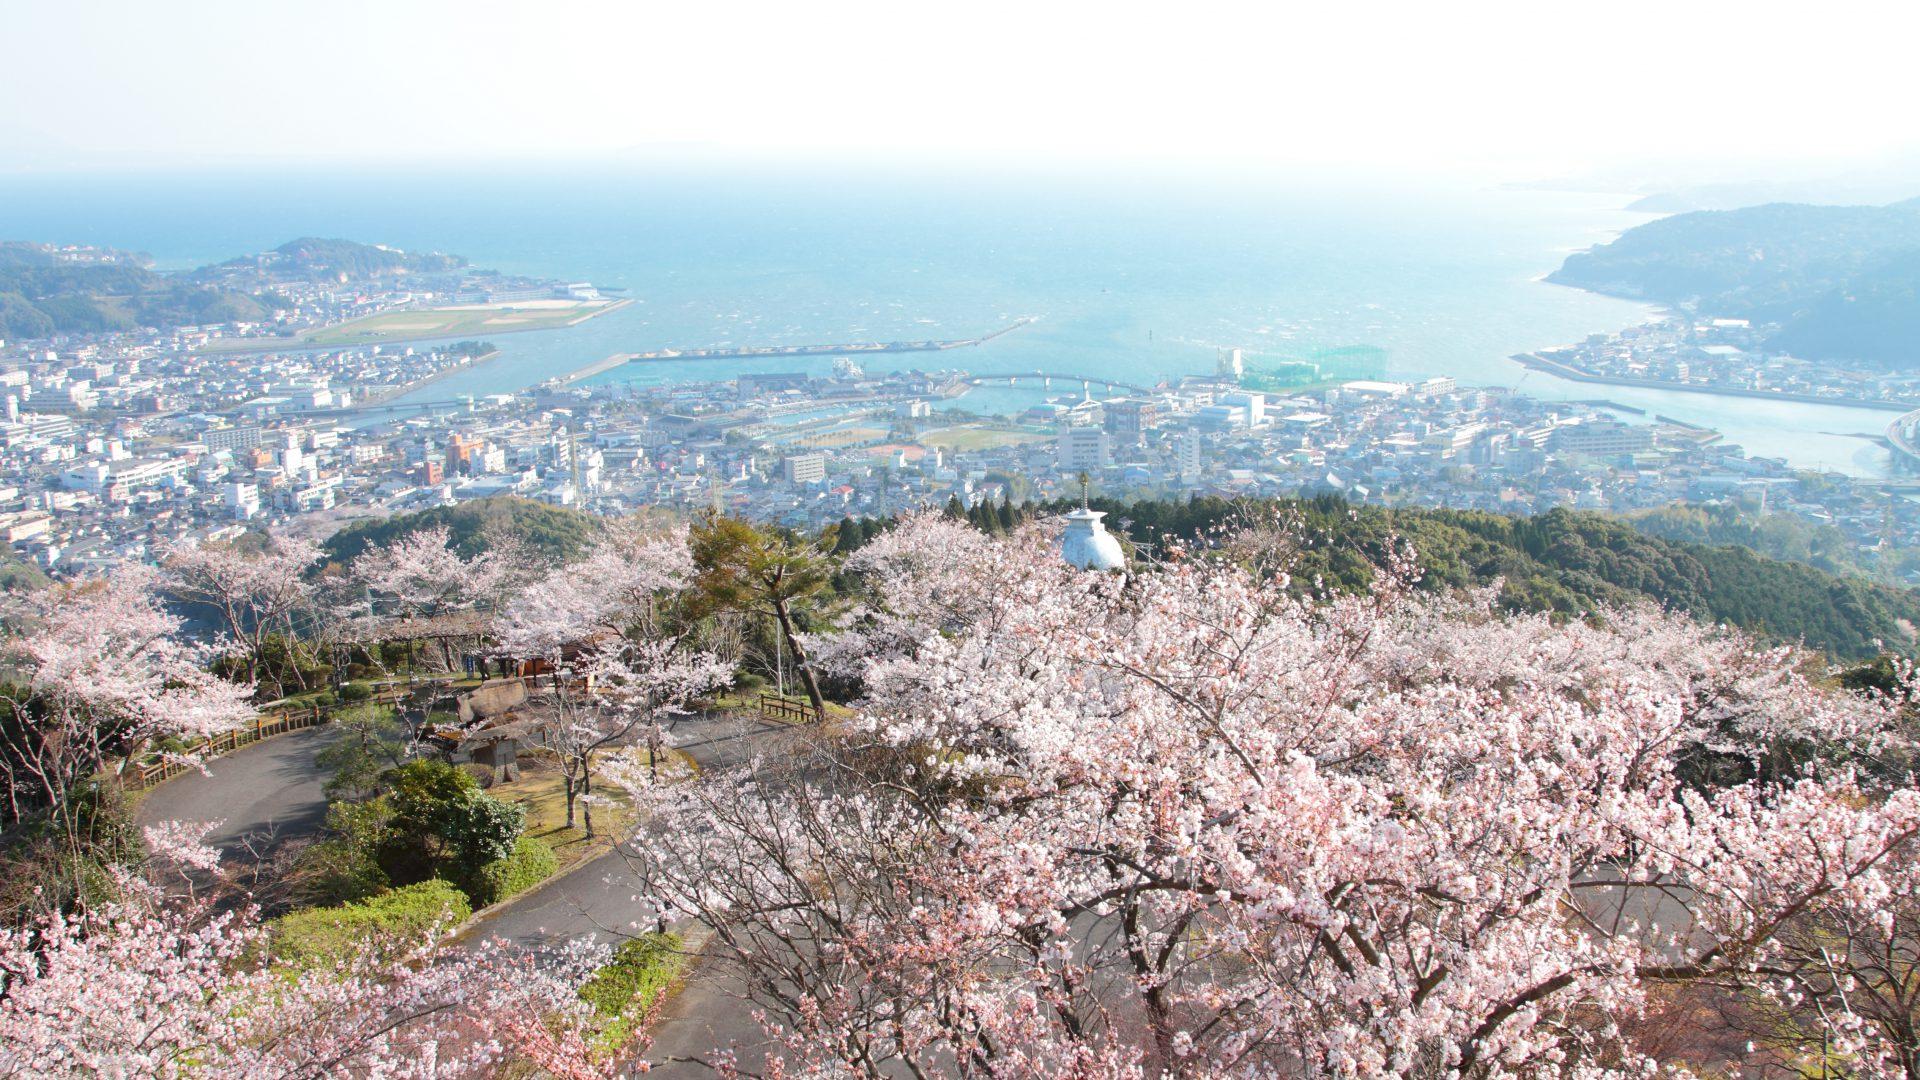 十万山 - 熊本県天草観光ガイド